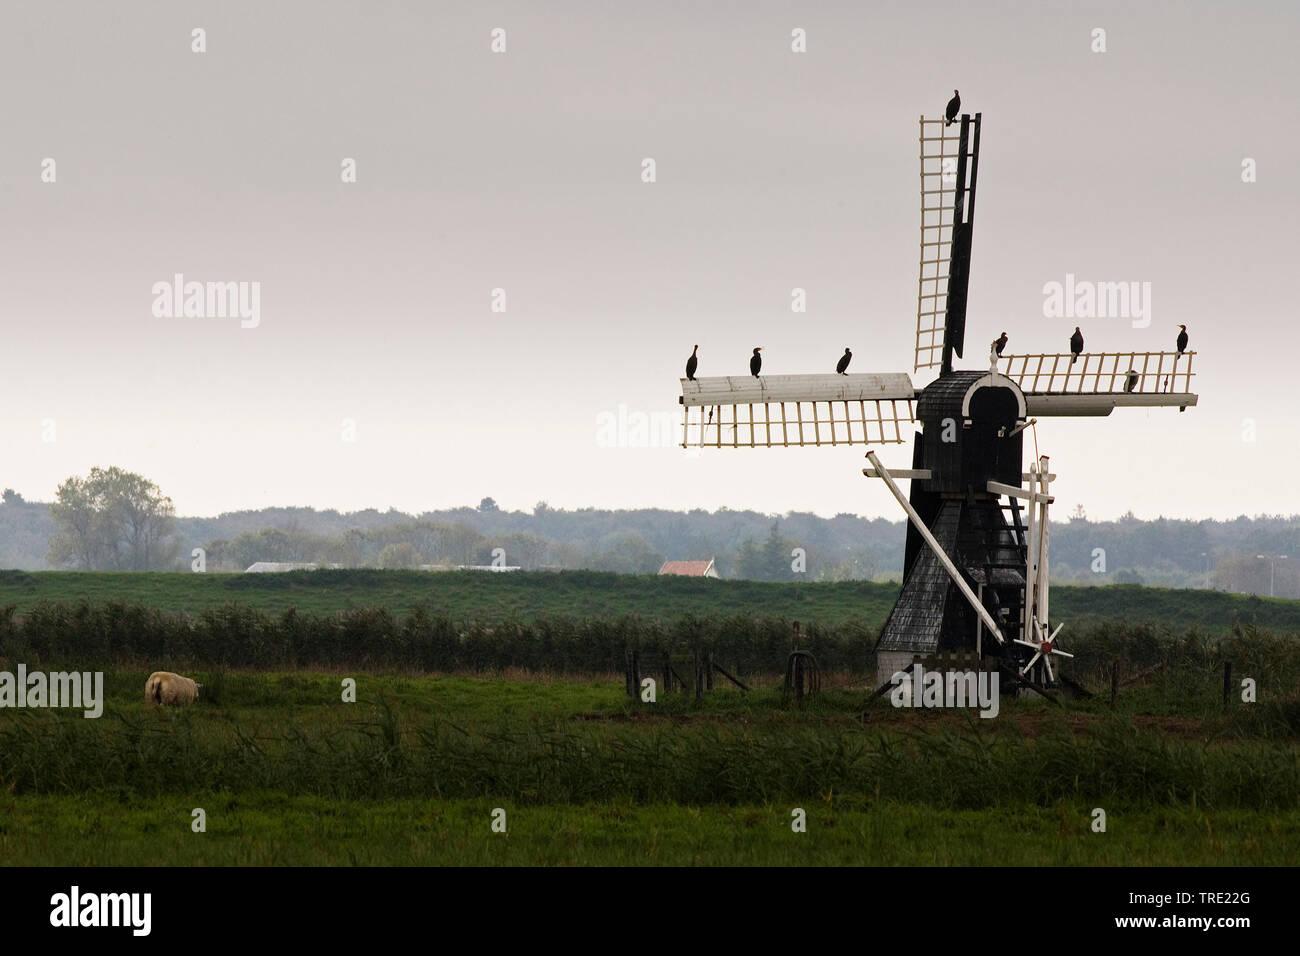 Kormoran (Phalacrocorax carbo), Kormorane sitzen auf den Fluegeln einer Windmuehle bei Waal en Burg, Niederlande, Texel | great cormorant (Phalacrocor - Stock Image